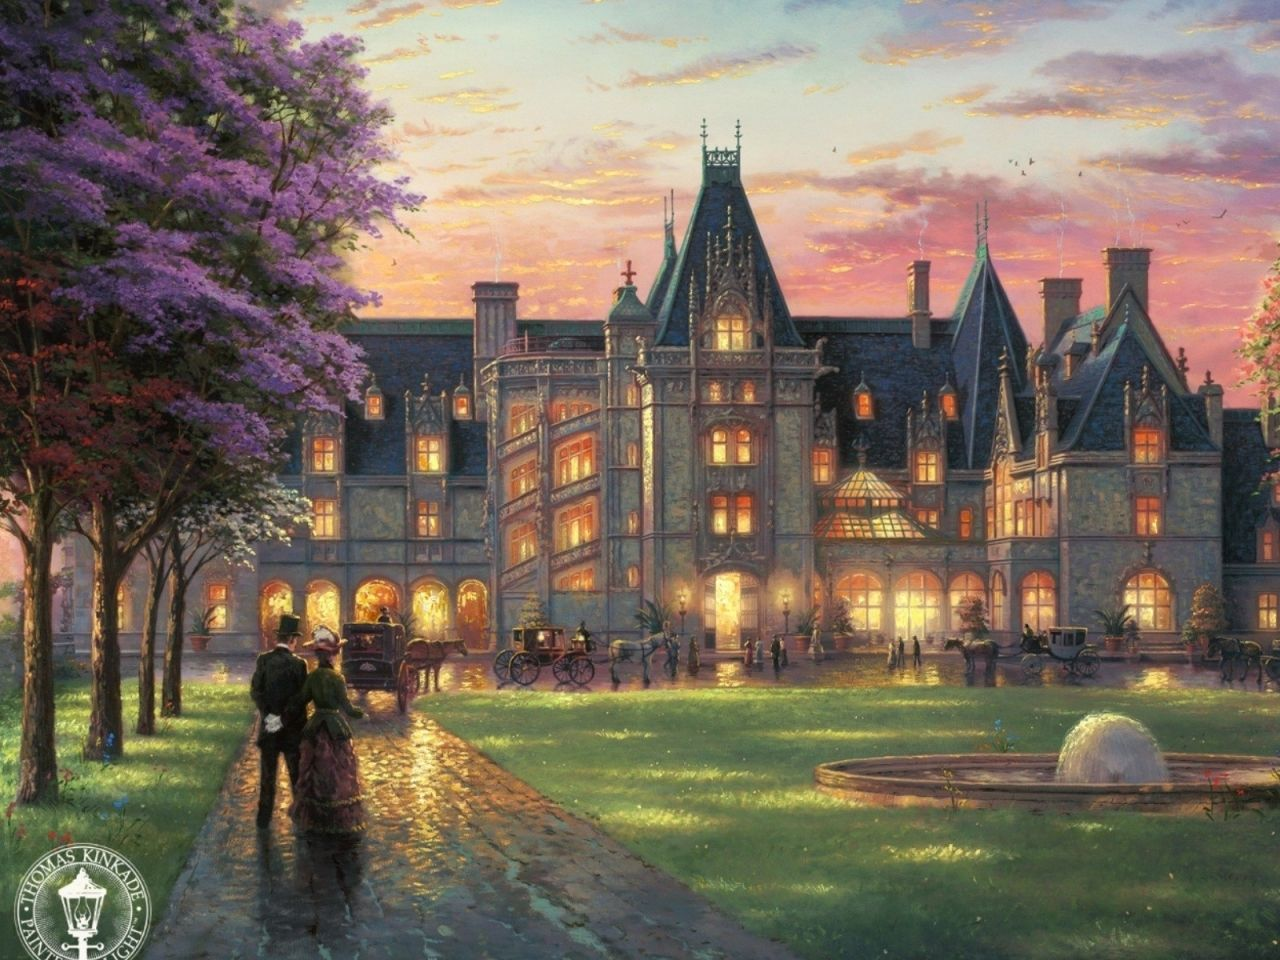 thomas kinkade mansion in heaven paintings castles garden people